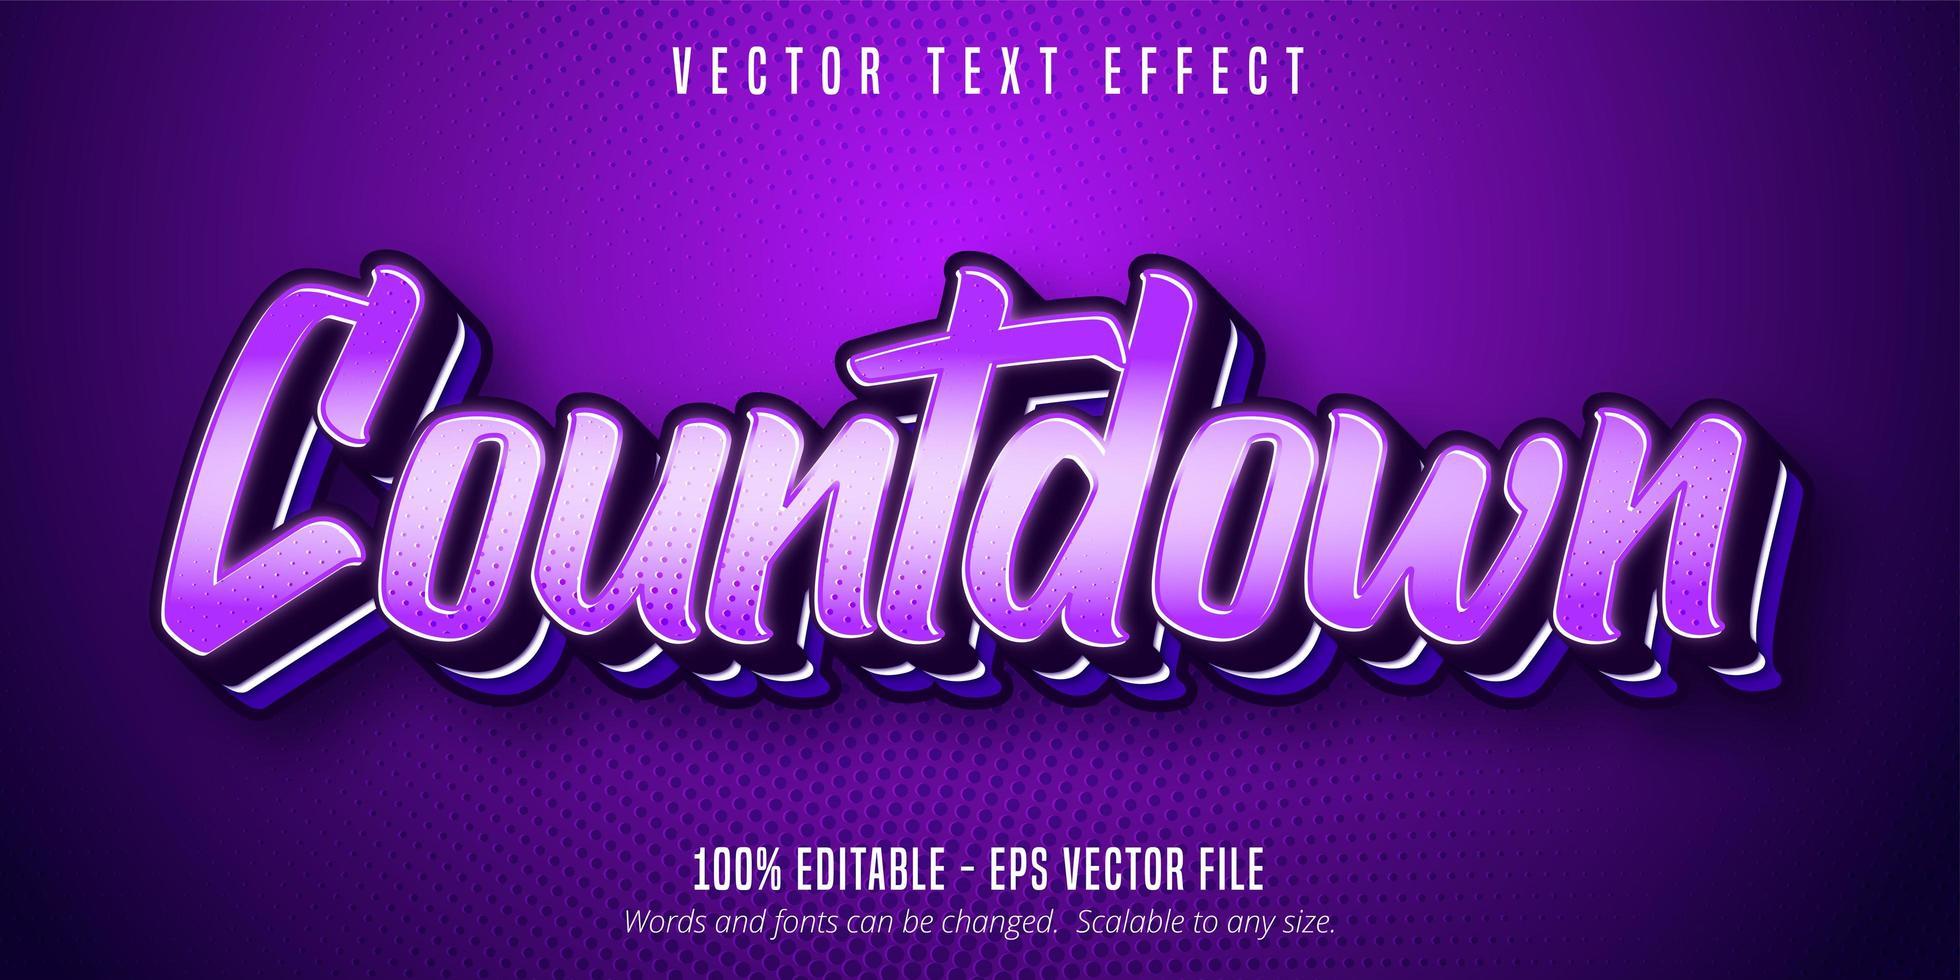 afteltekst, popart teksteffect in paarse kleur vector